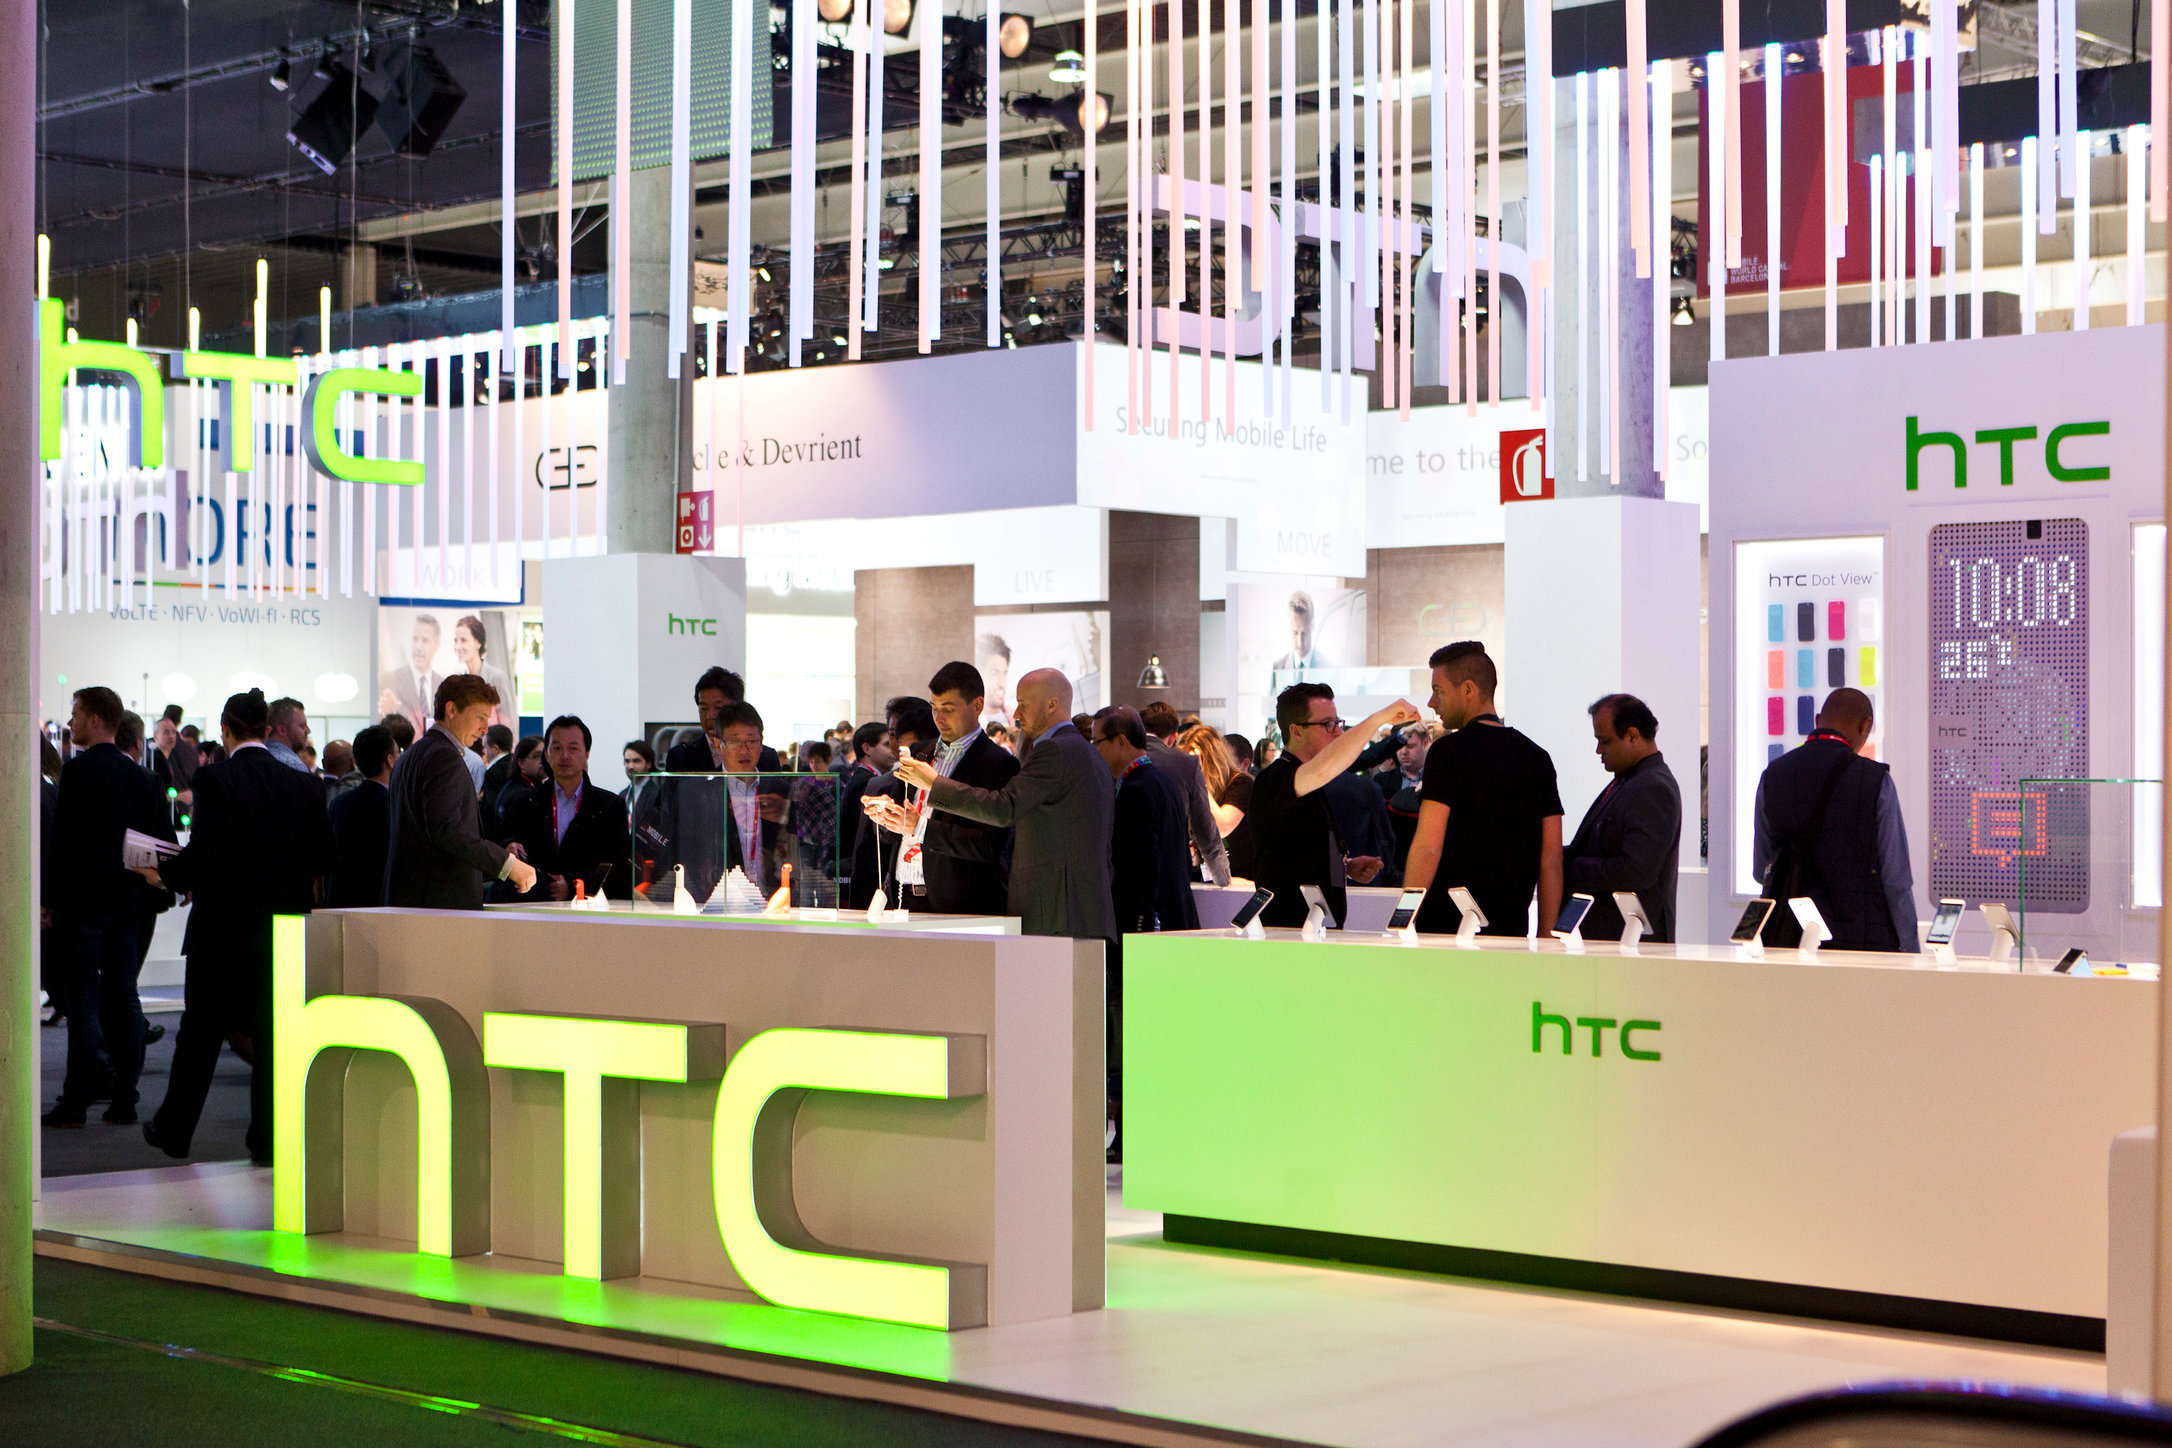 0005_HTC-MWC2015-3779-HighRes.jpg